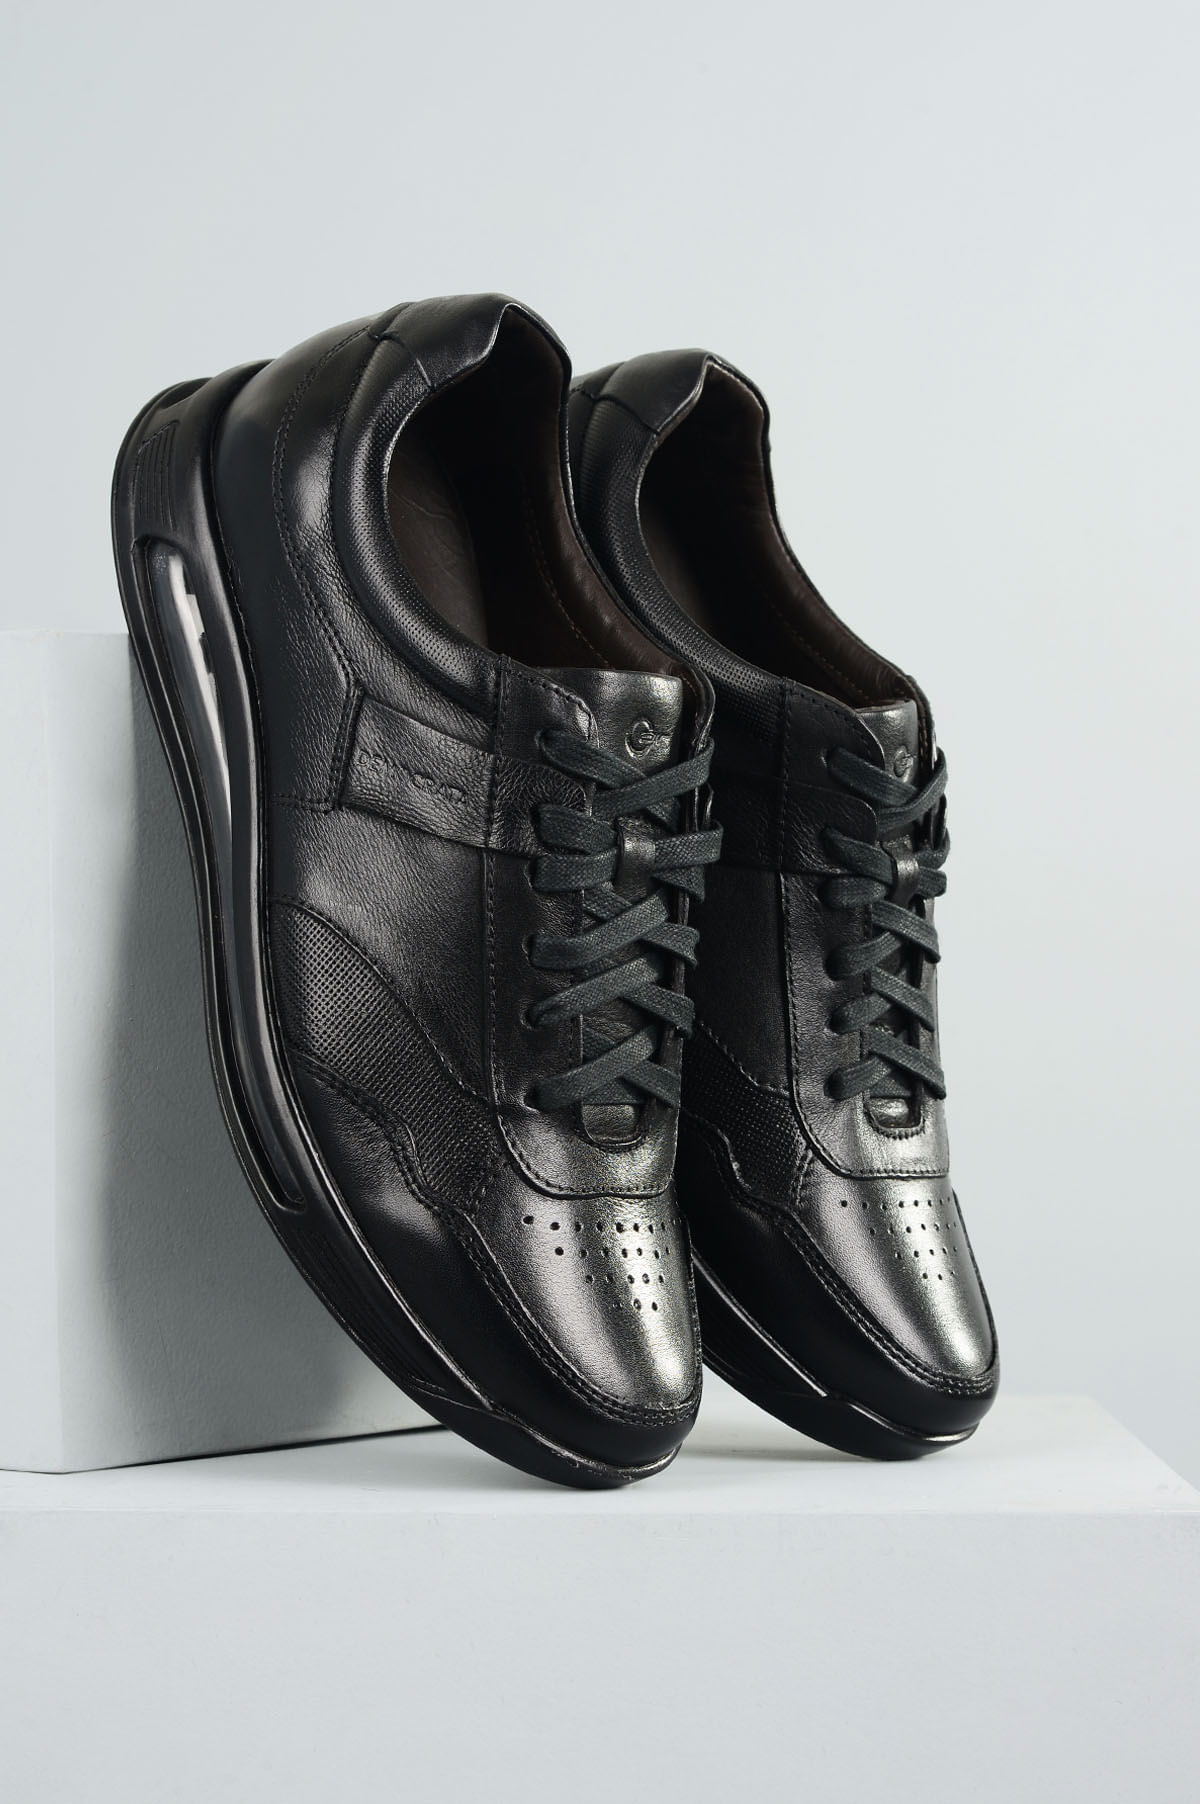 d320089f25c Sapato Masculino Democrata Air 360 CR-PRETO - Mundial Calçados